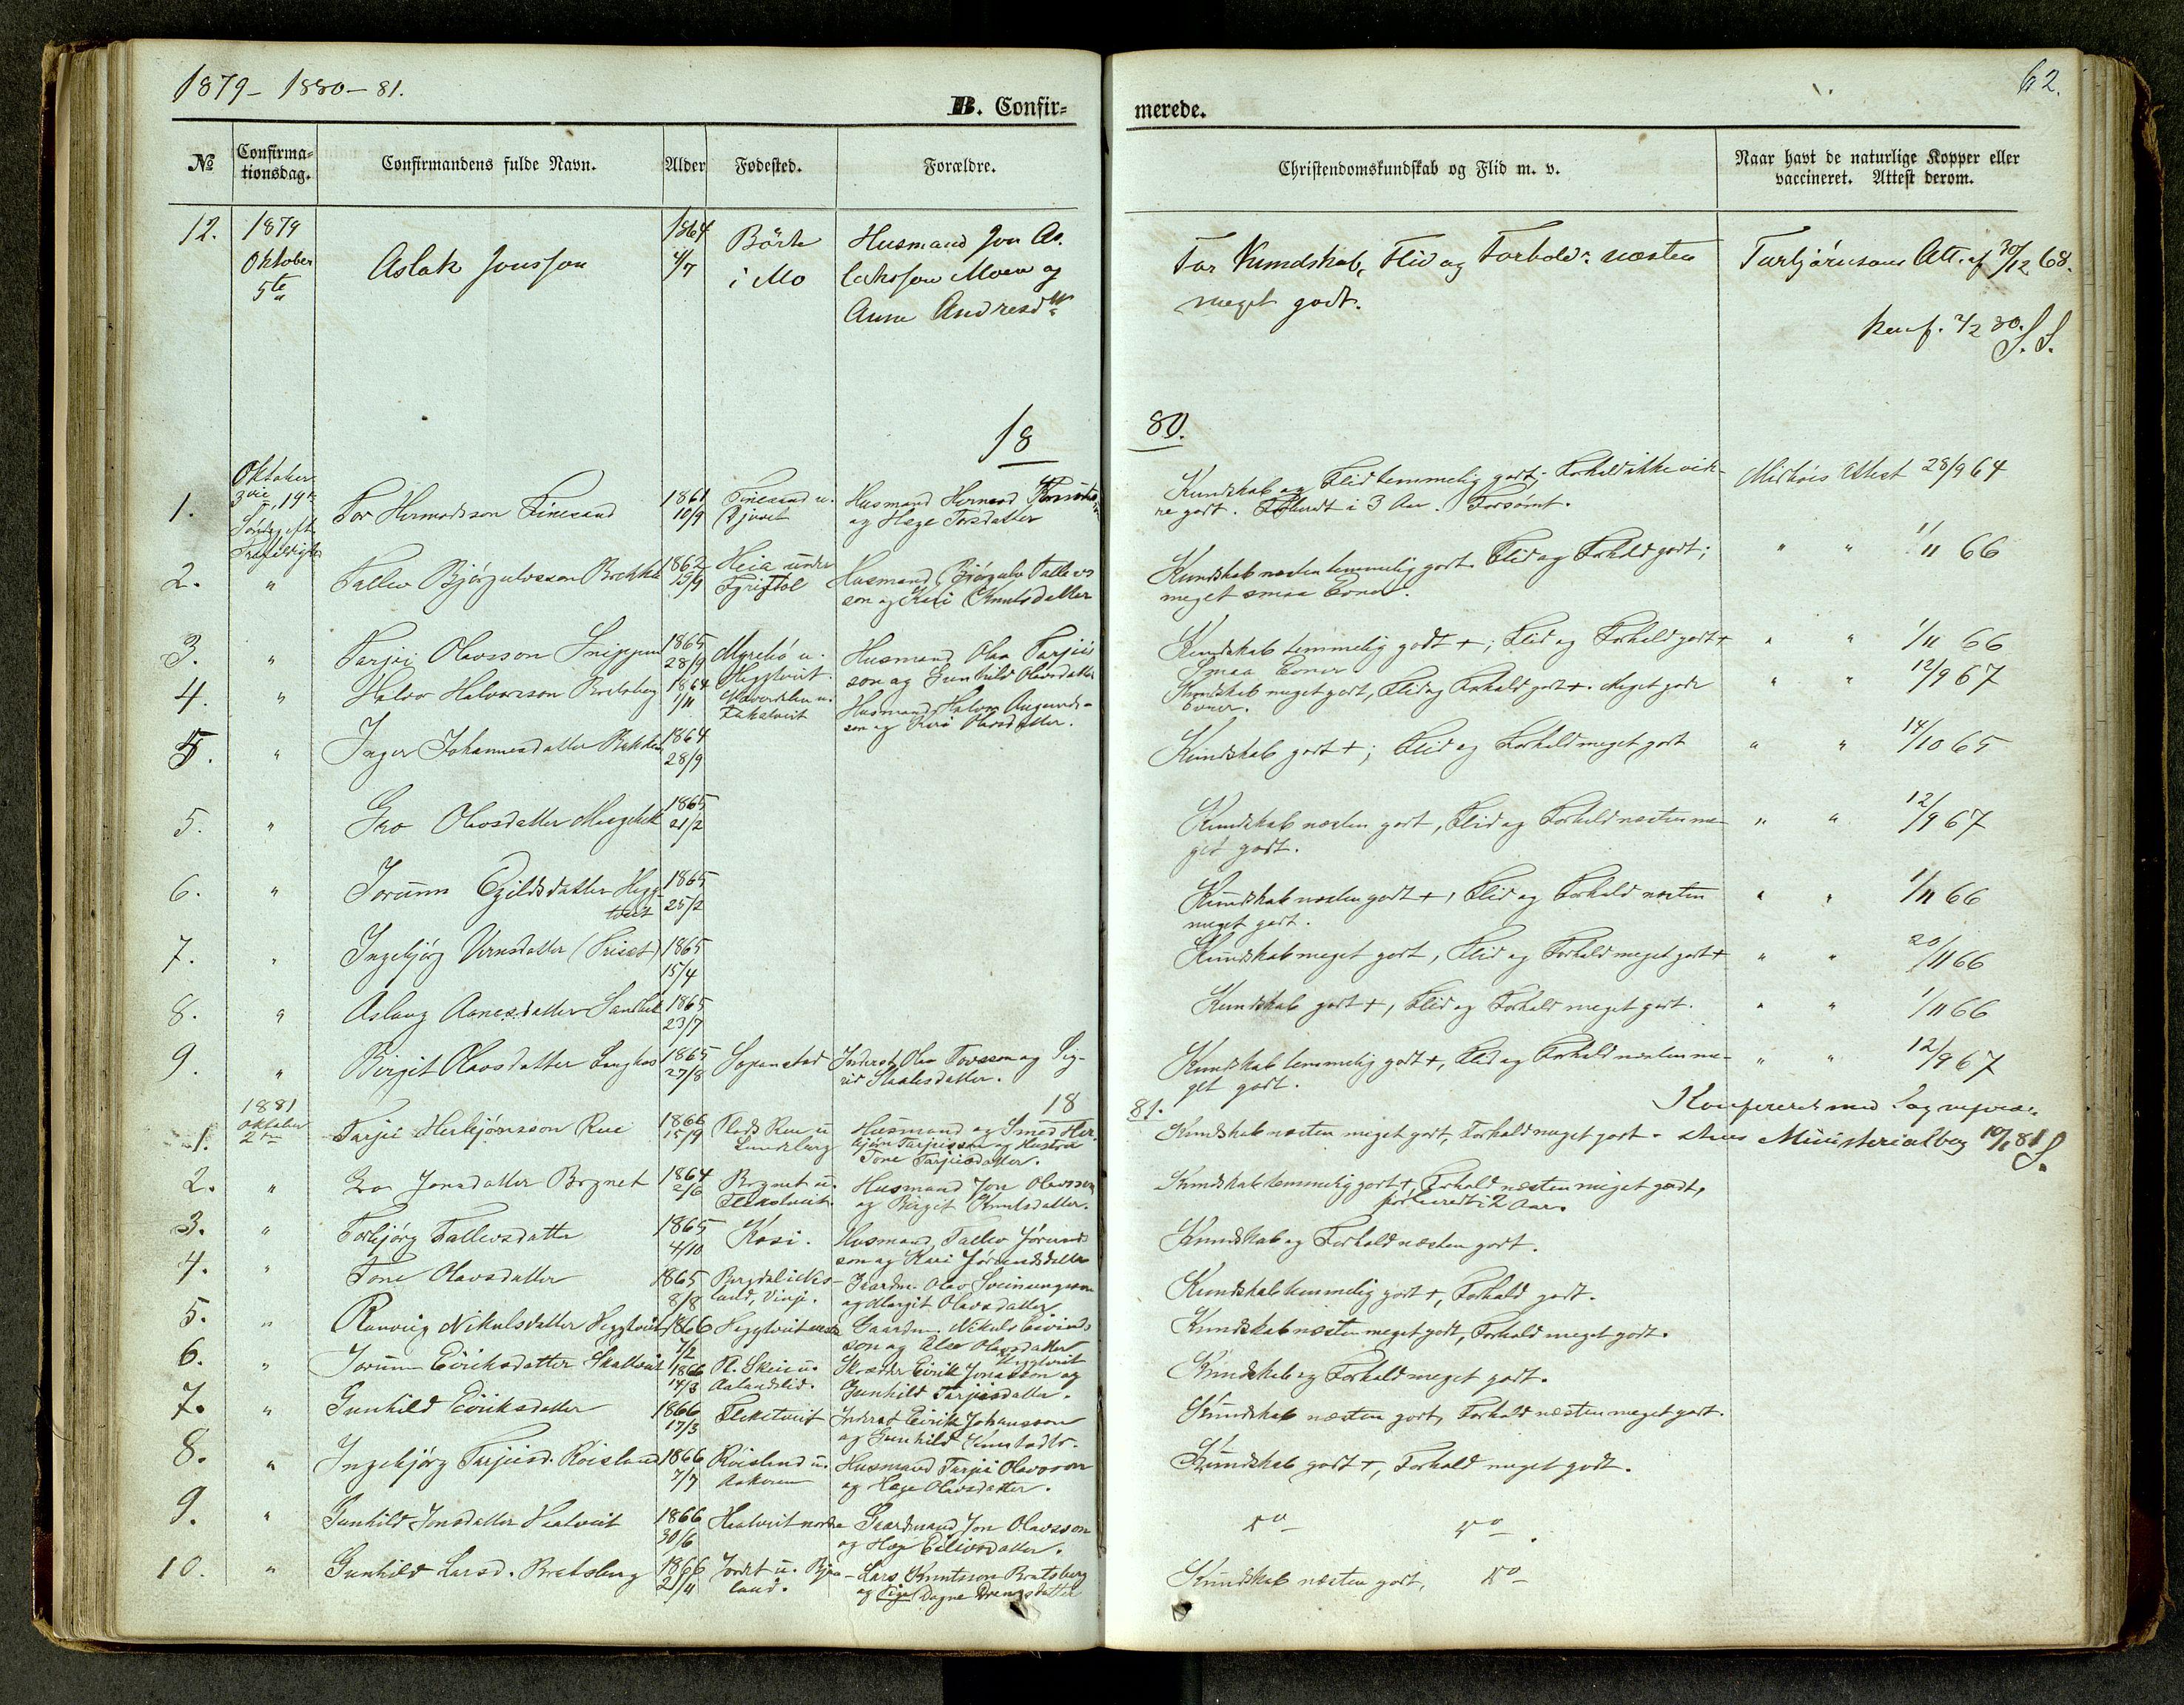 SAKO, Lårdal kirkebøker, G/Ga/L0002: Klokkerbok nr. I 2, 1861-1890, s. 62